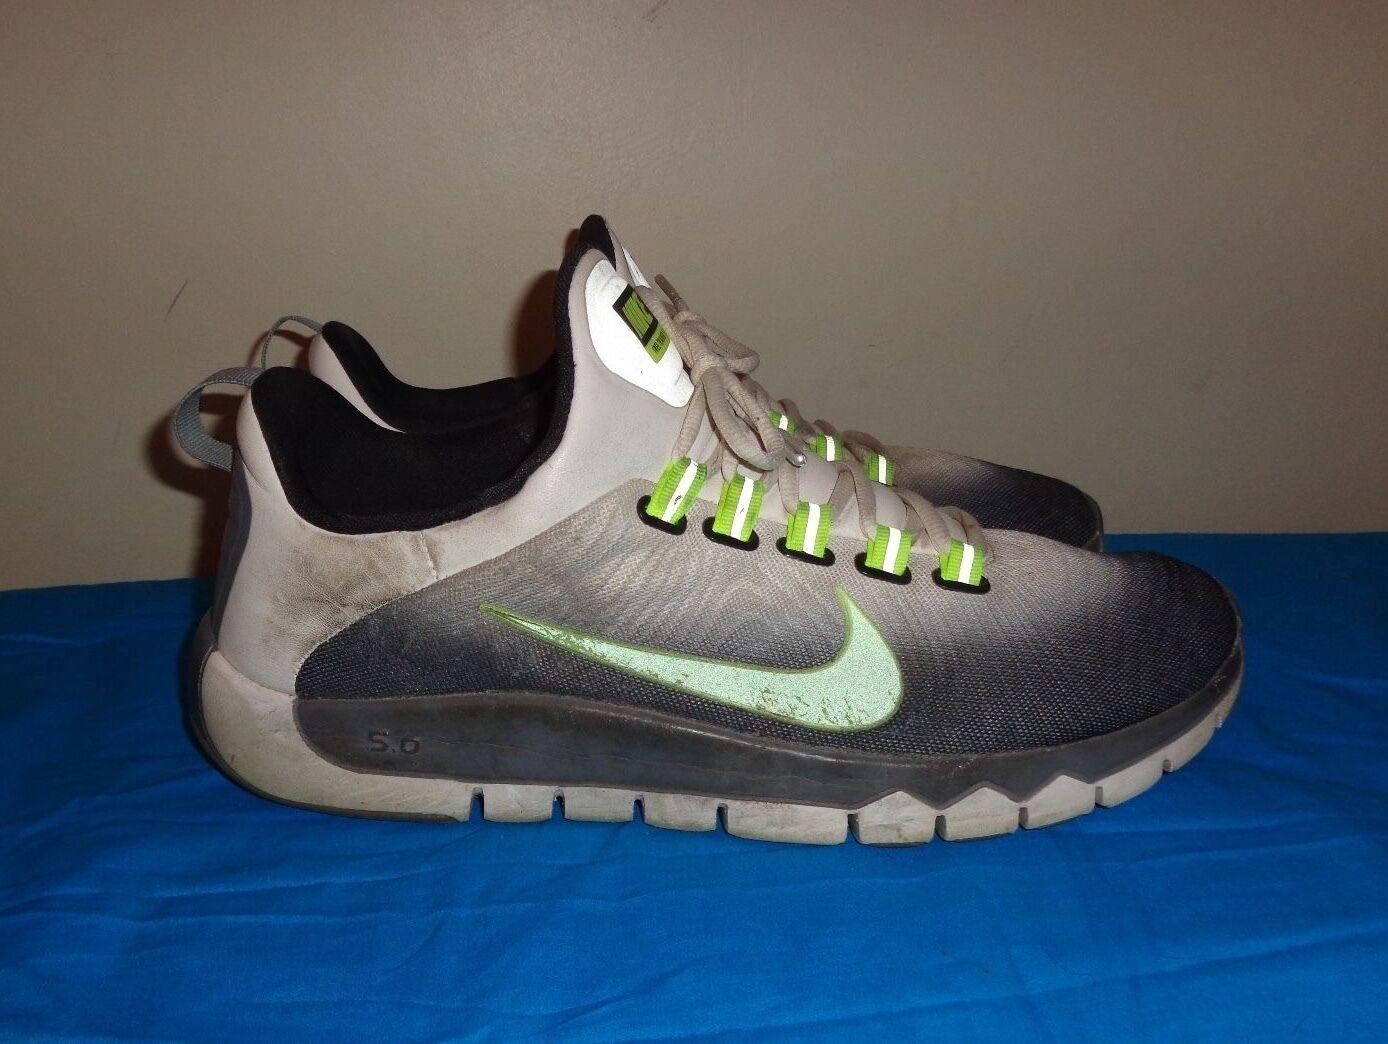 hombre Nike Trainer 5.0 13 V5 running zapatos talla 13 5.0 l @ @ K! eea56b